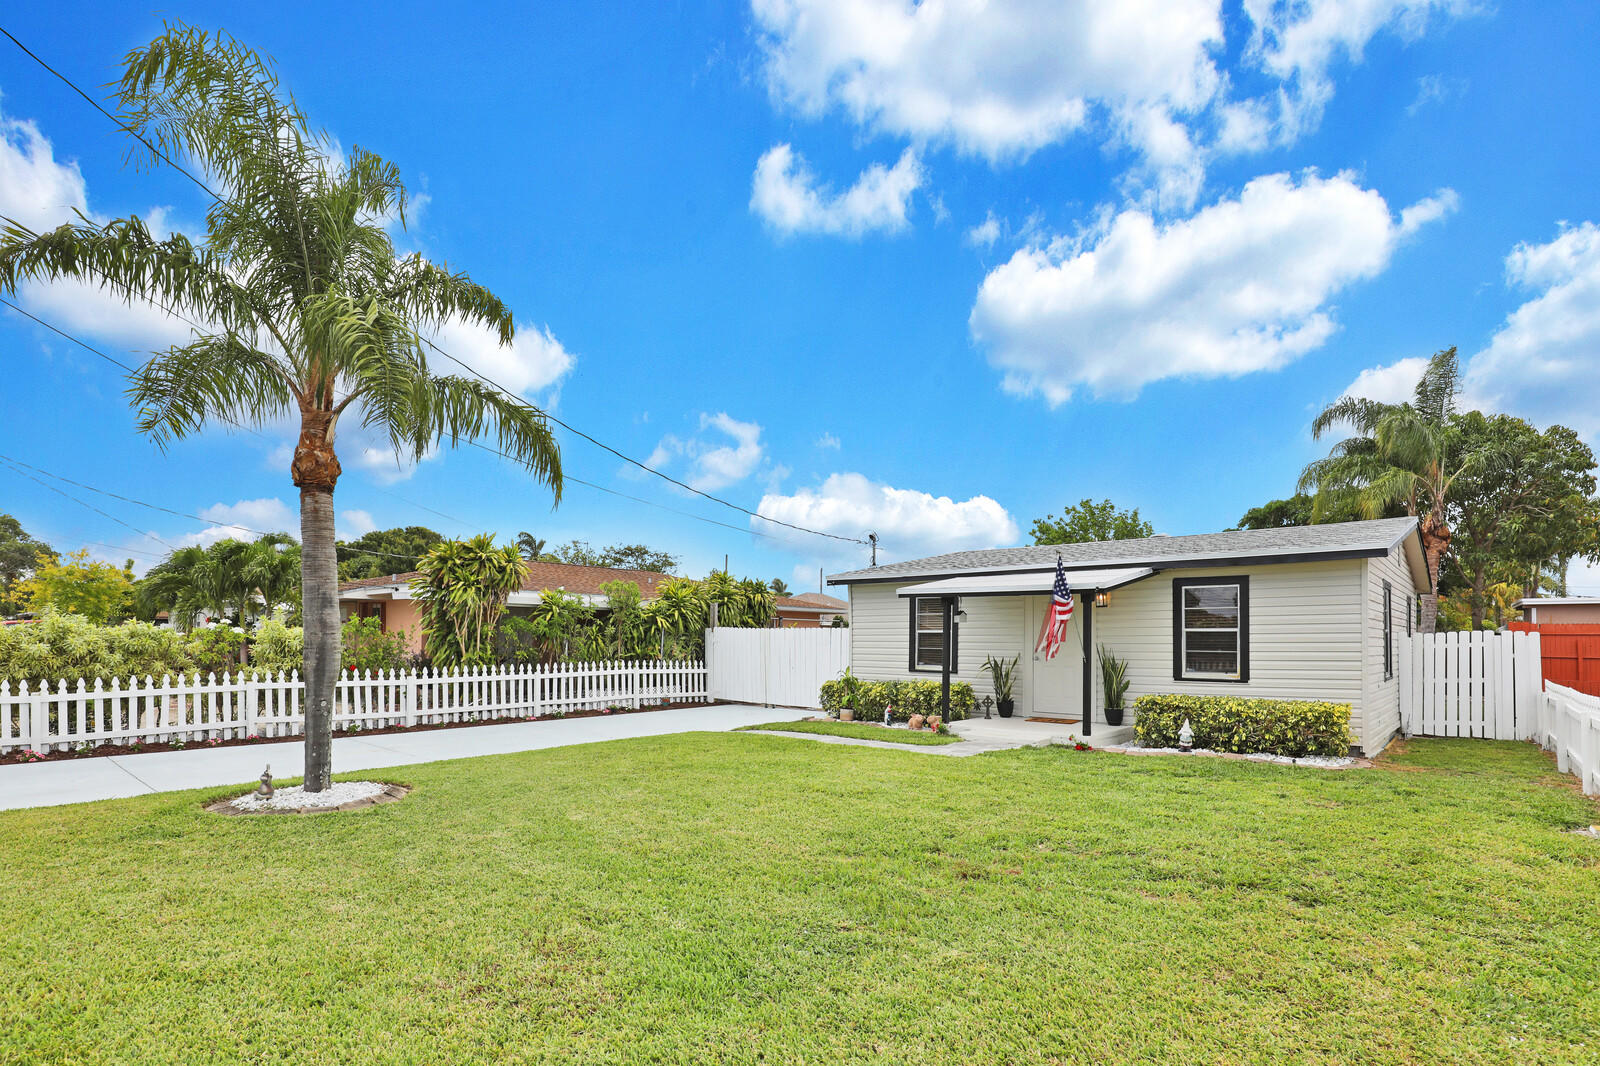 2683  Florida Street  For Sale 10721361, FL